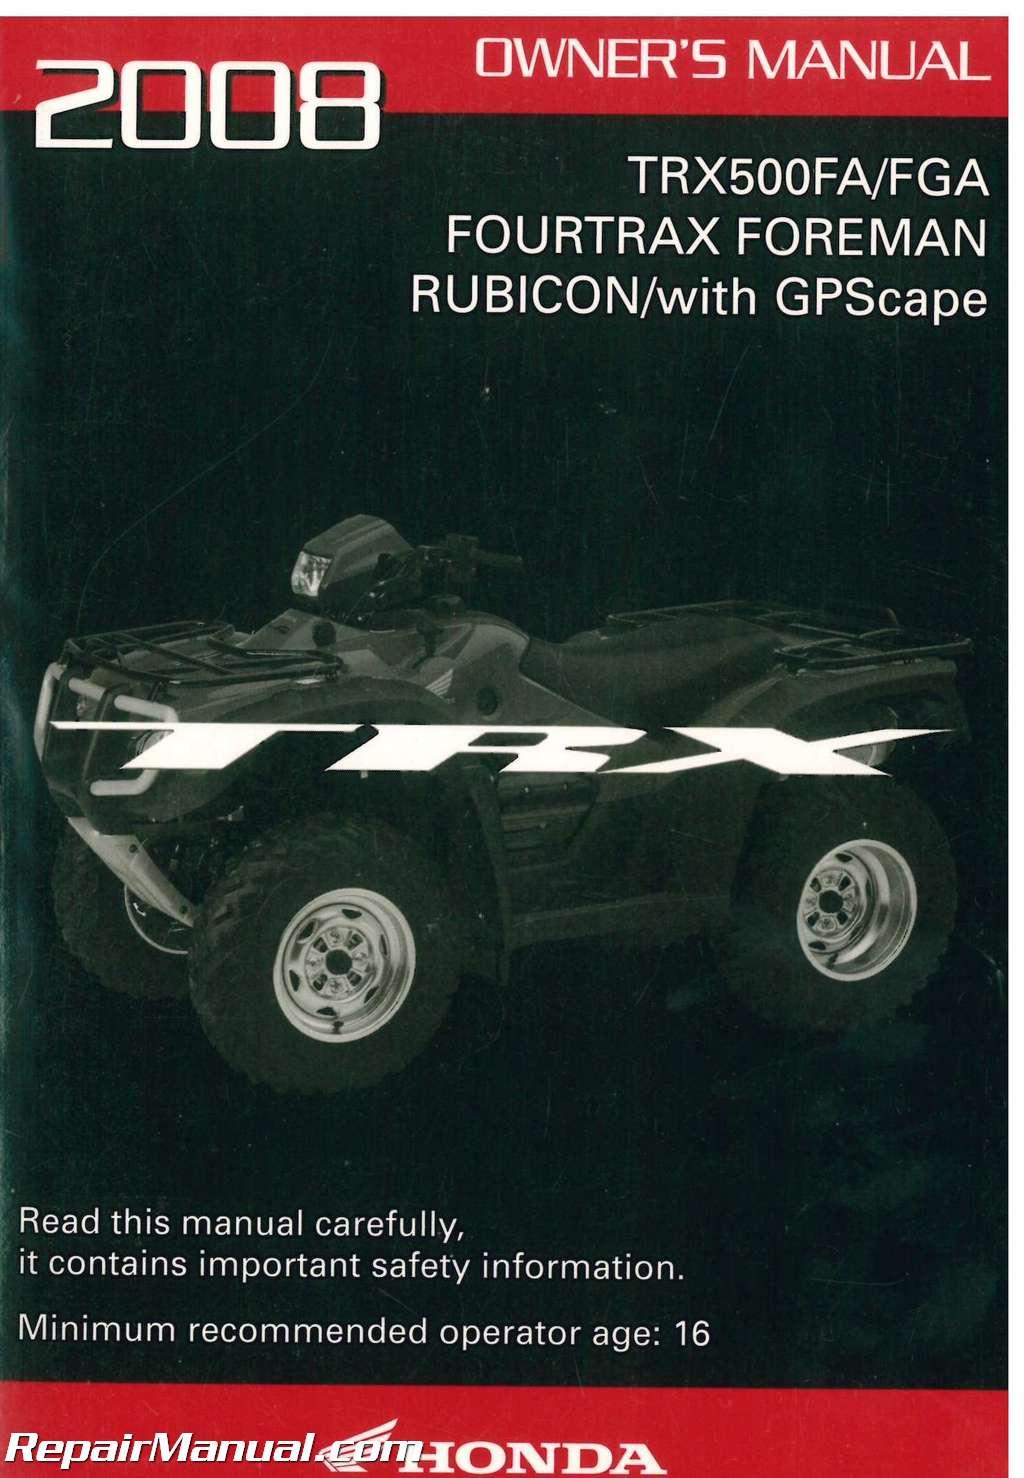 Honda Foreman Rubicon 500 Service Manual